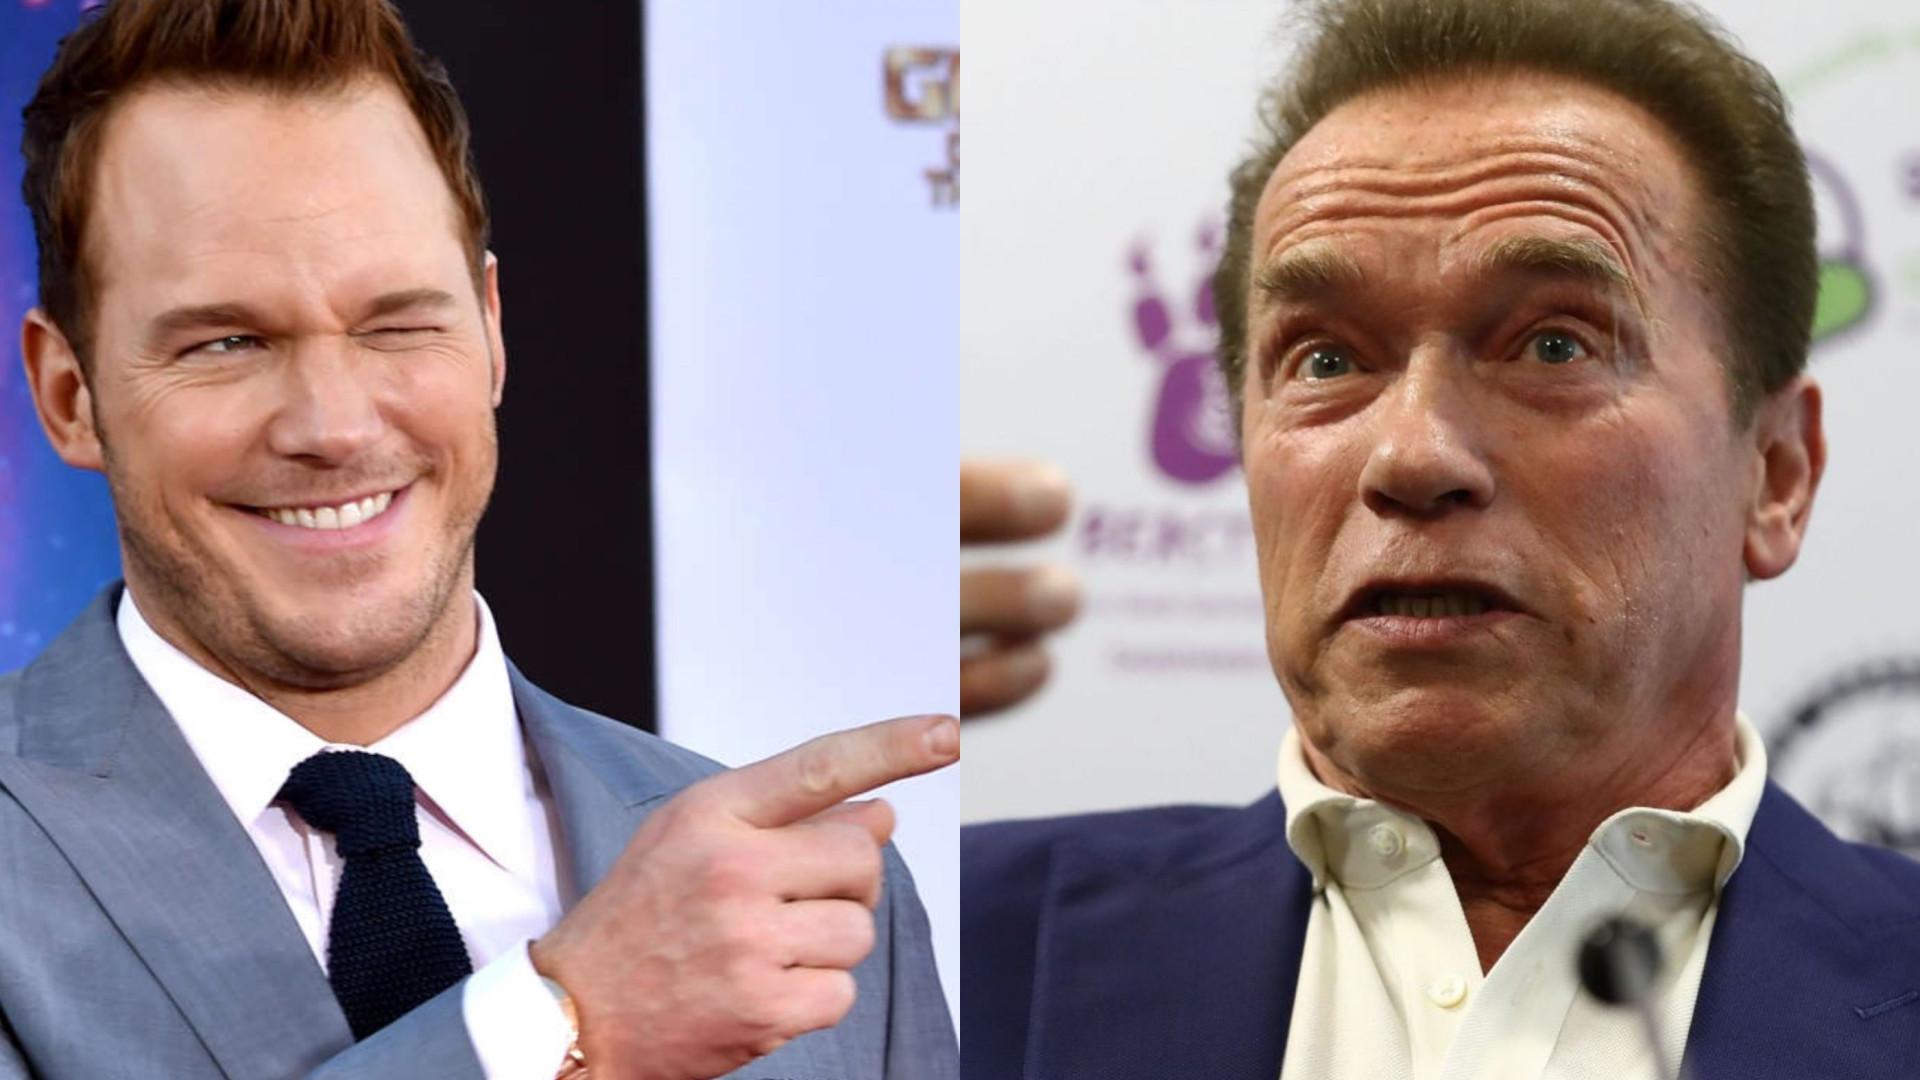 Chris Pratt toma pequeno almoço com o sogro, Arnold Schwarzenegger